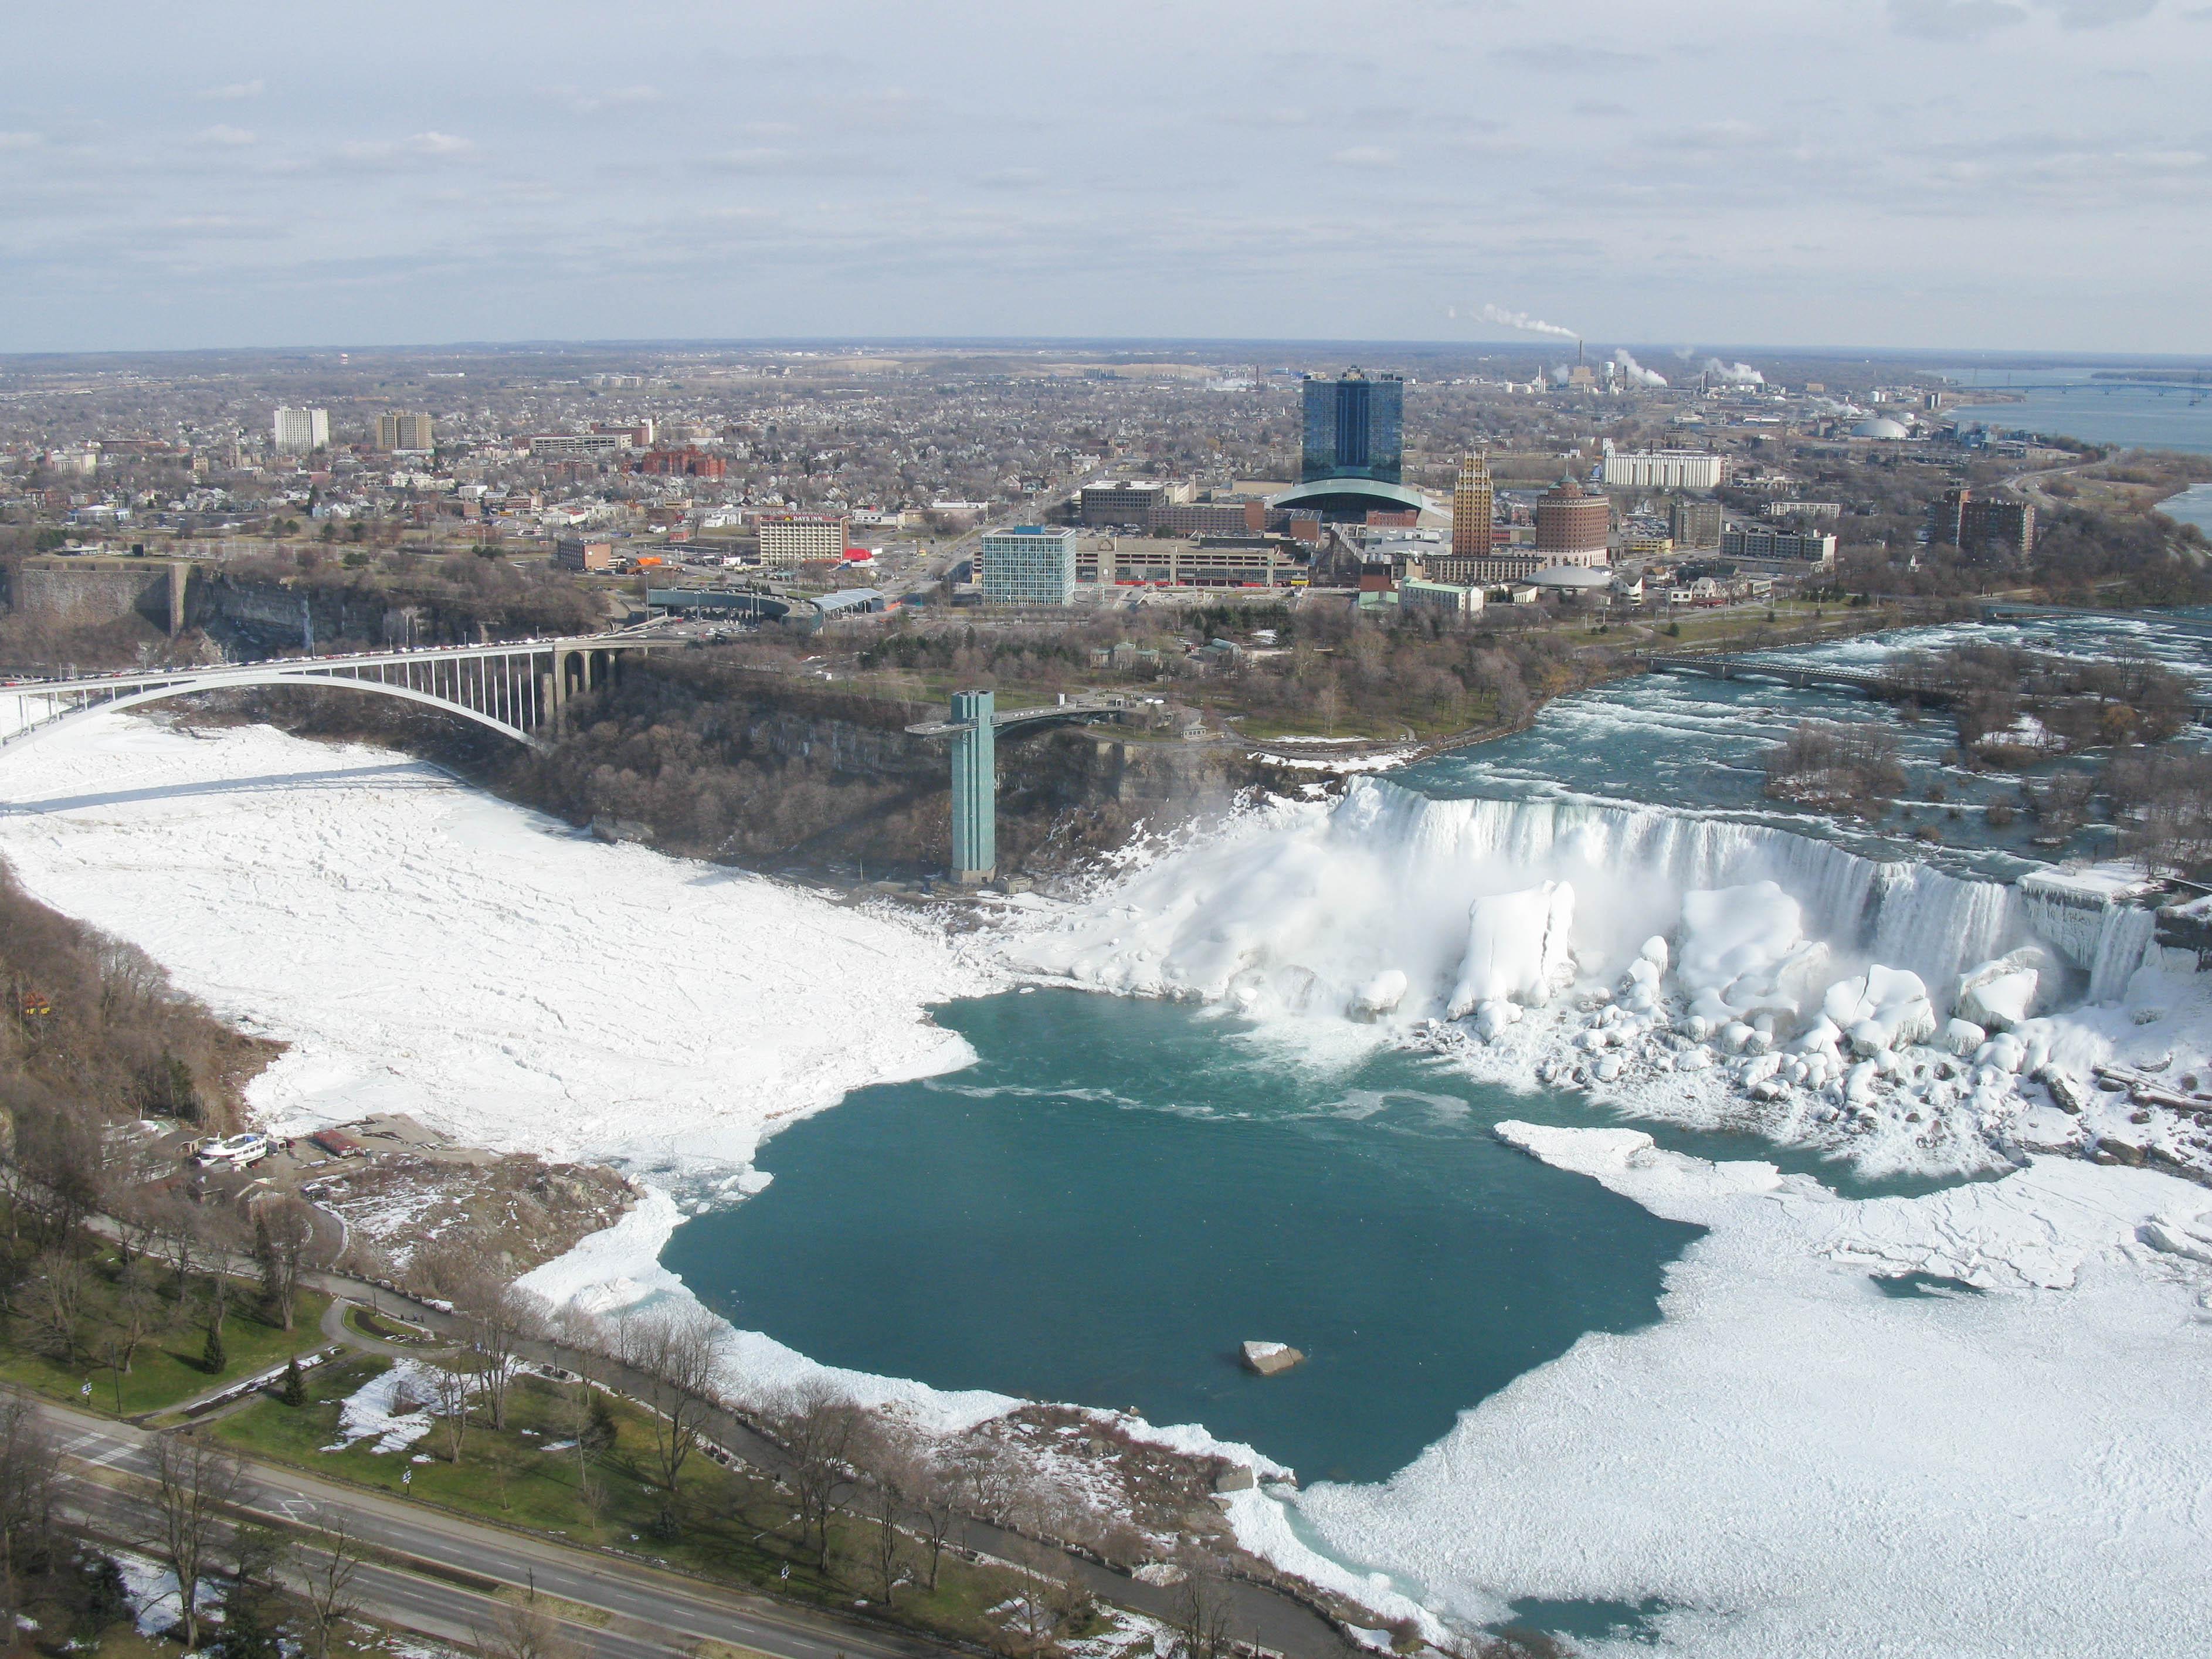 American Falls and the frozen Niagara River